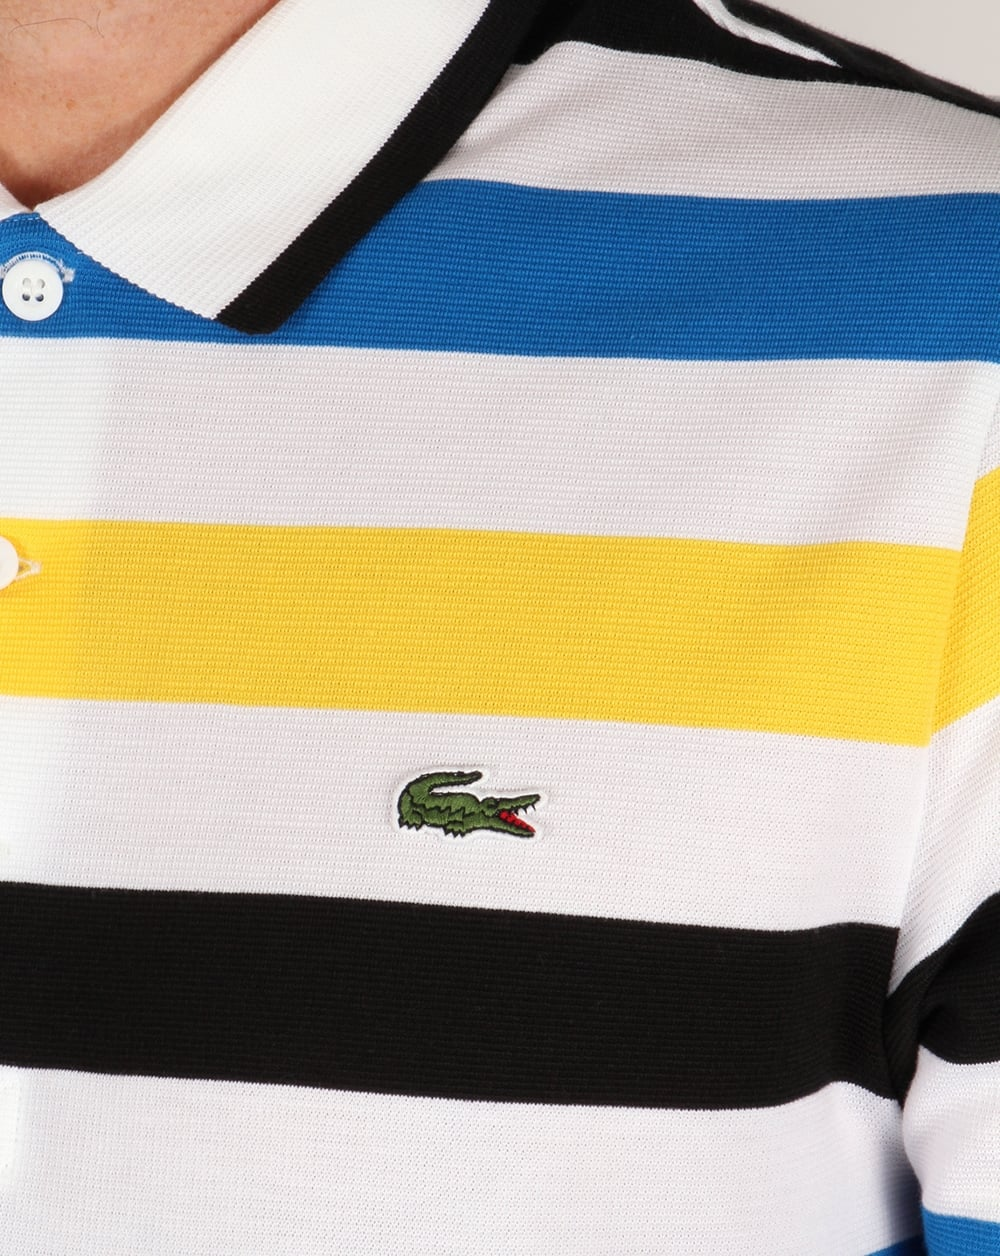 Timberland Shirts For Men